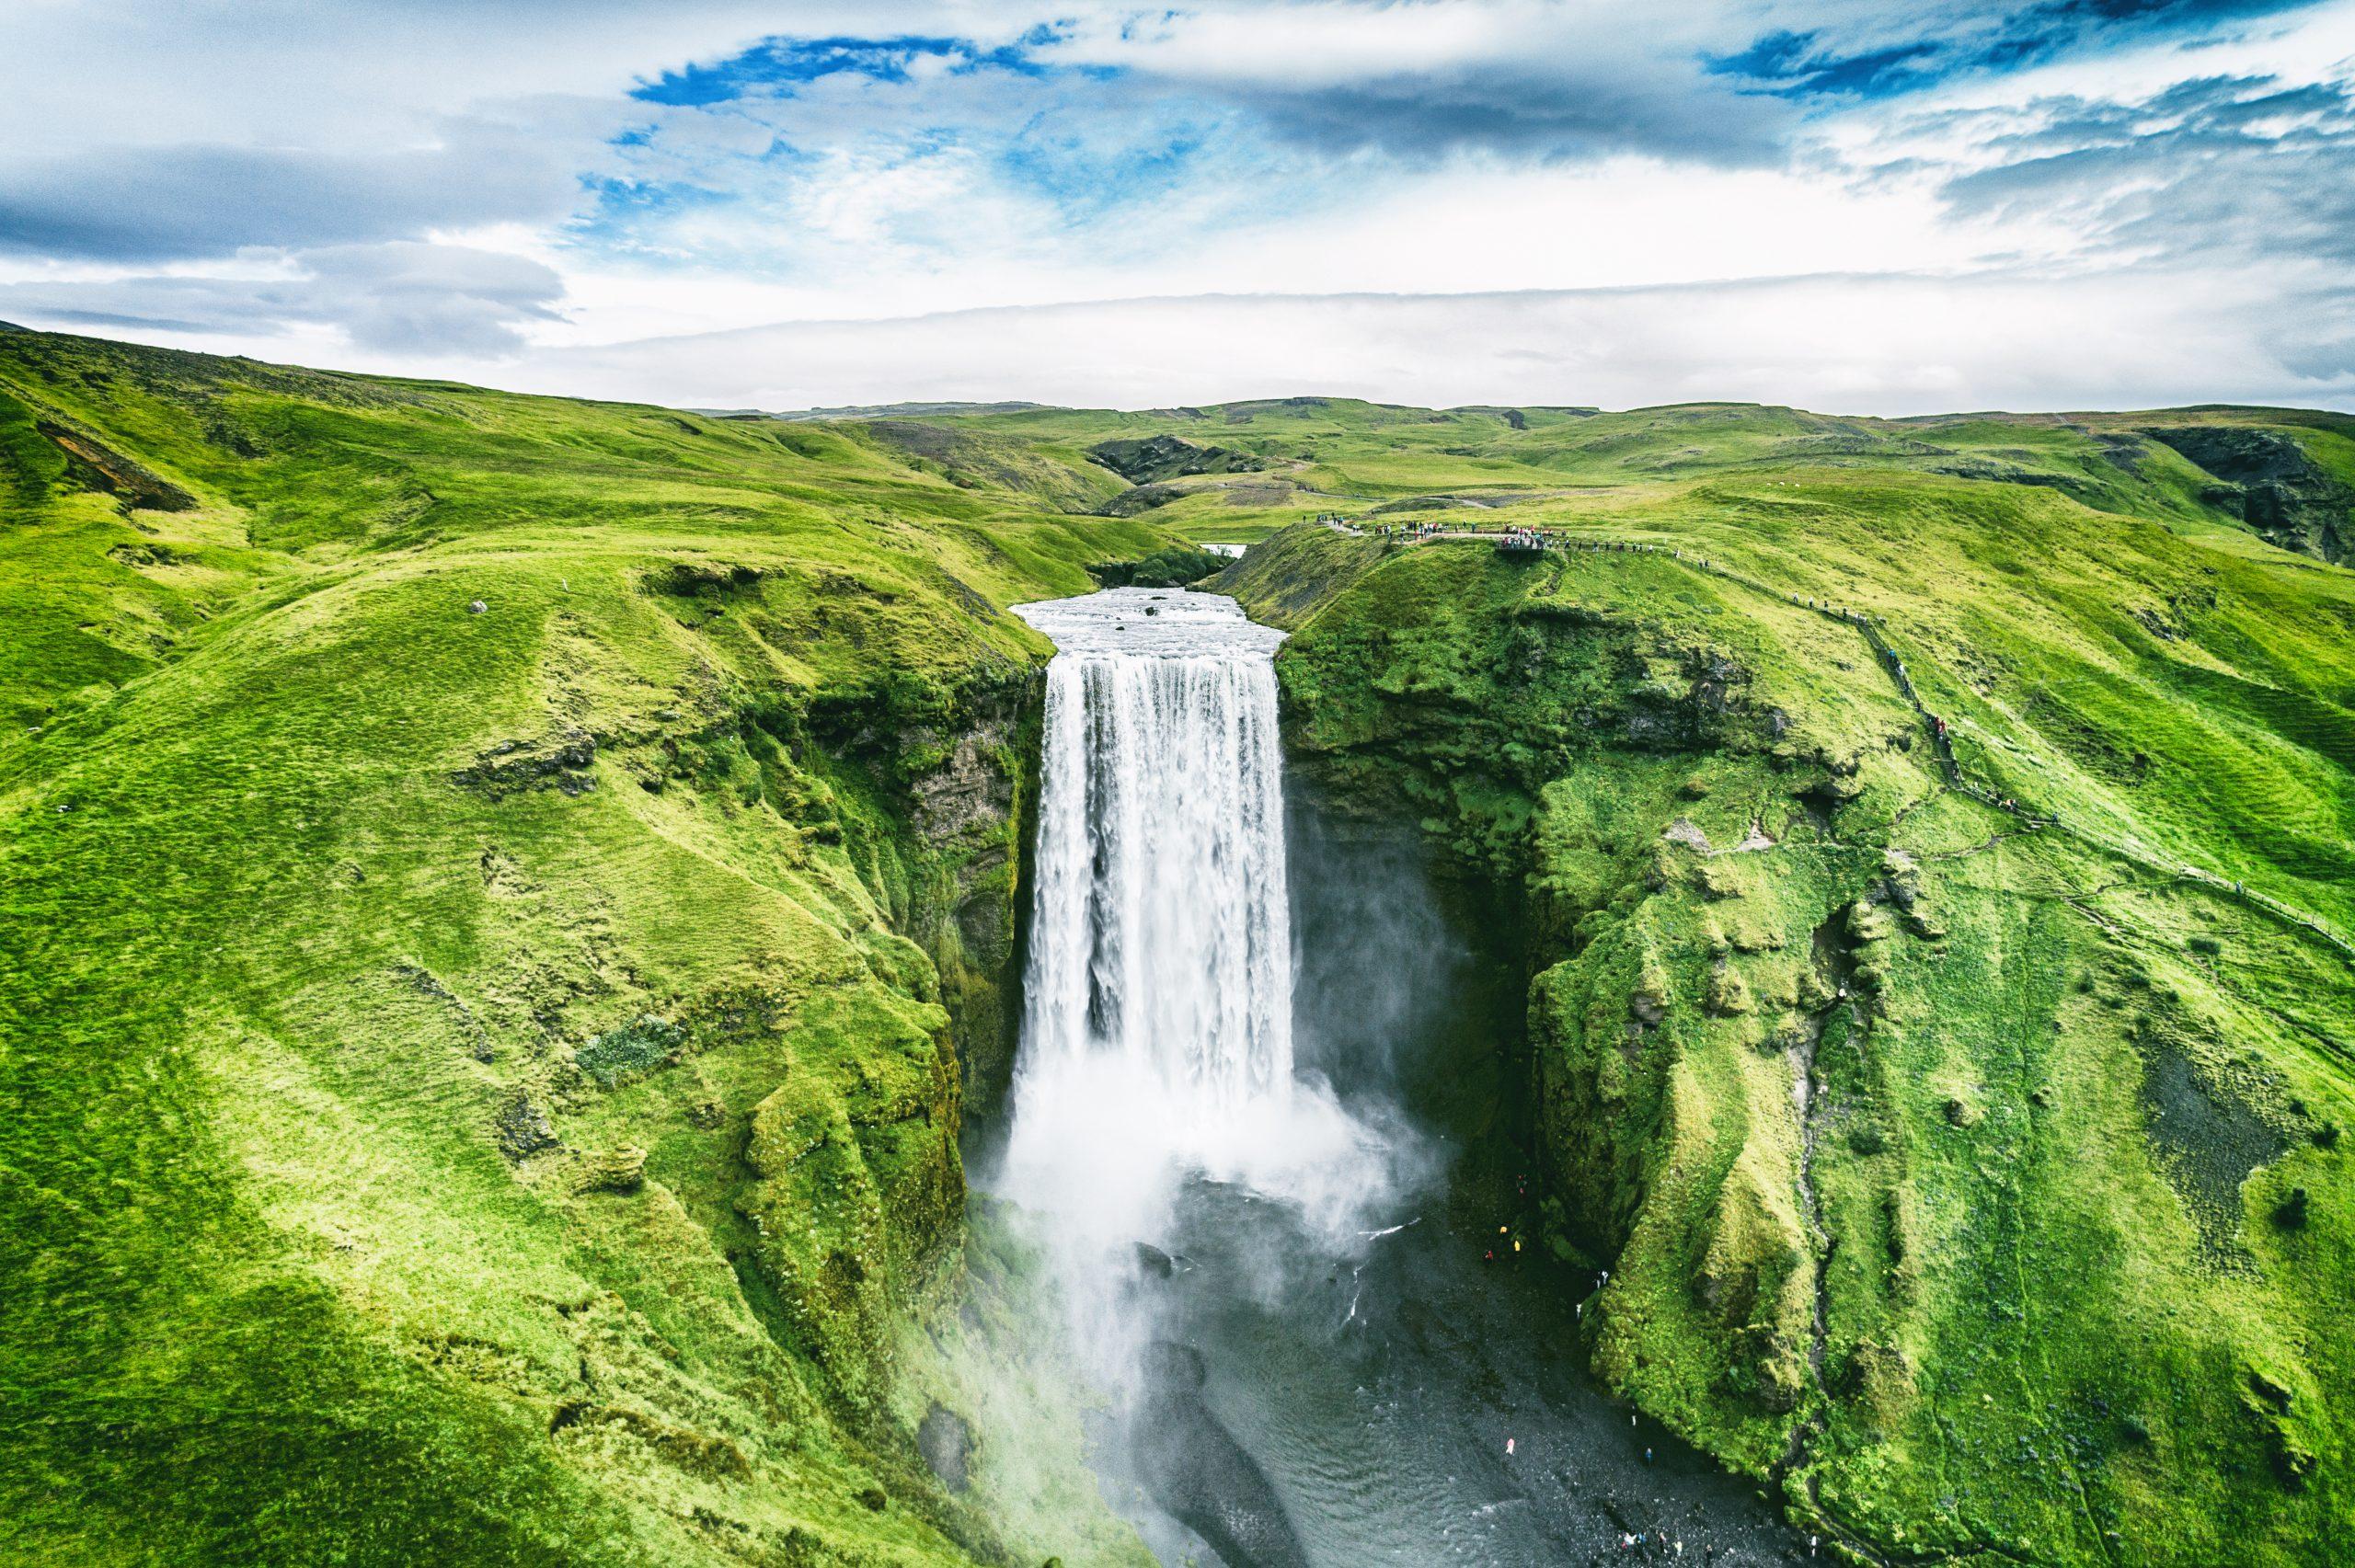 Birdseye view of Skogafoss Waterfall, Iceland